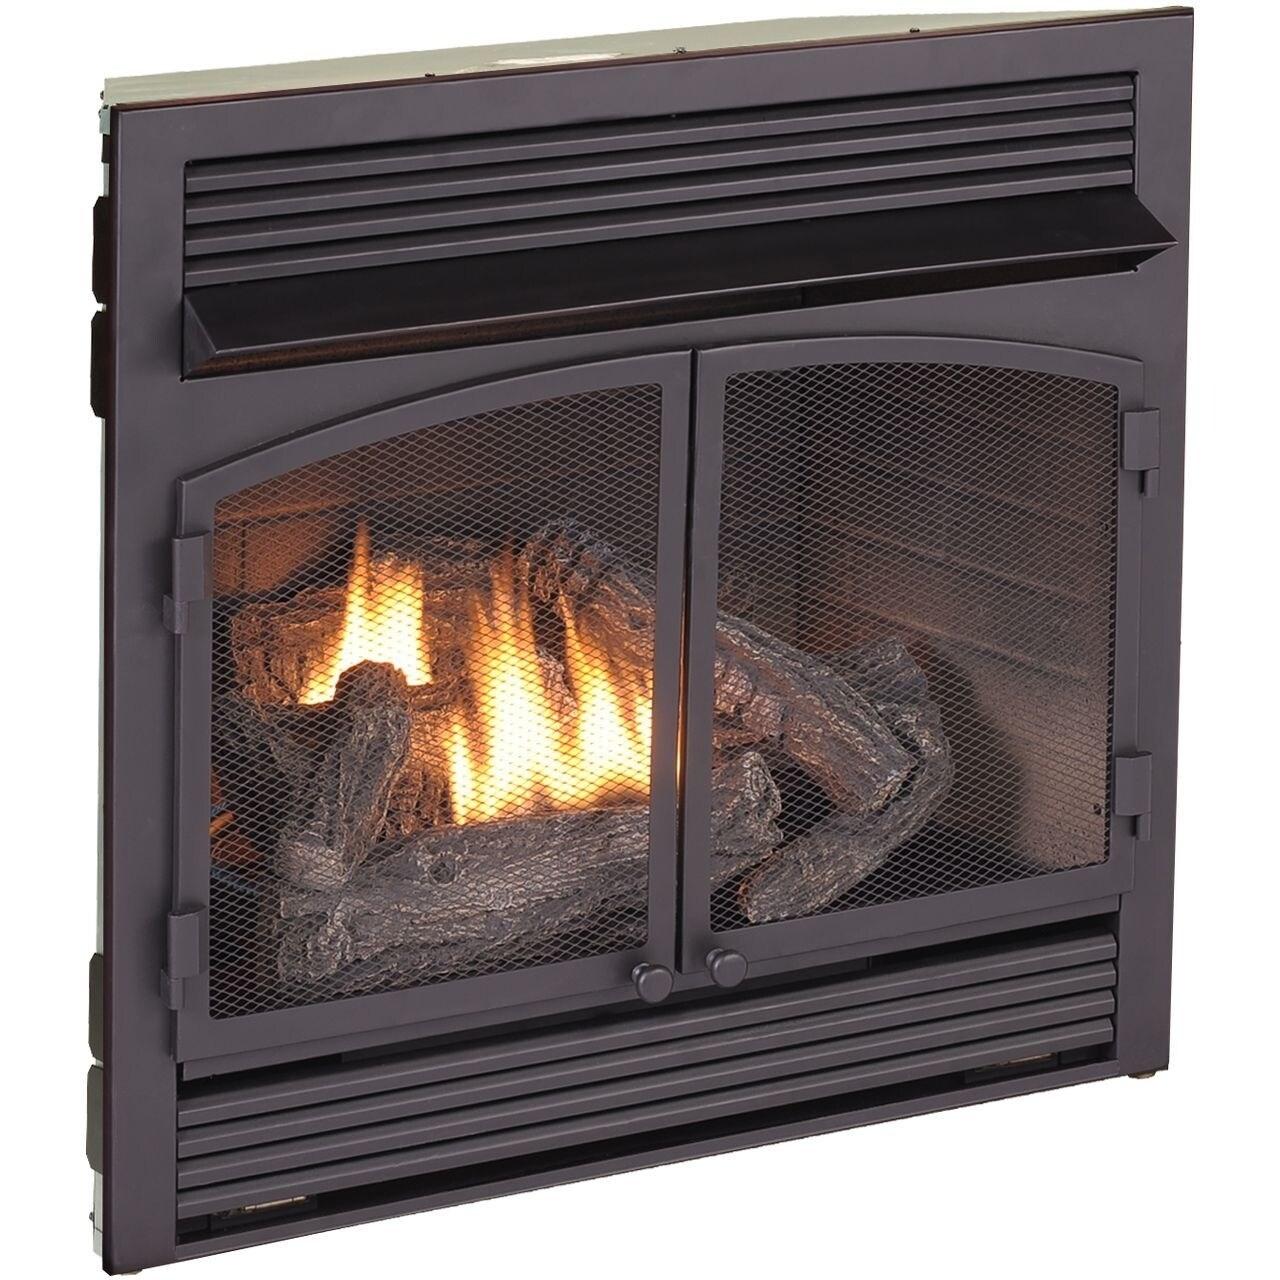 Shop Duluth Forge Dual Fuel Ventless Fireplace Insert 32 000 Btu